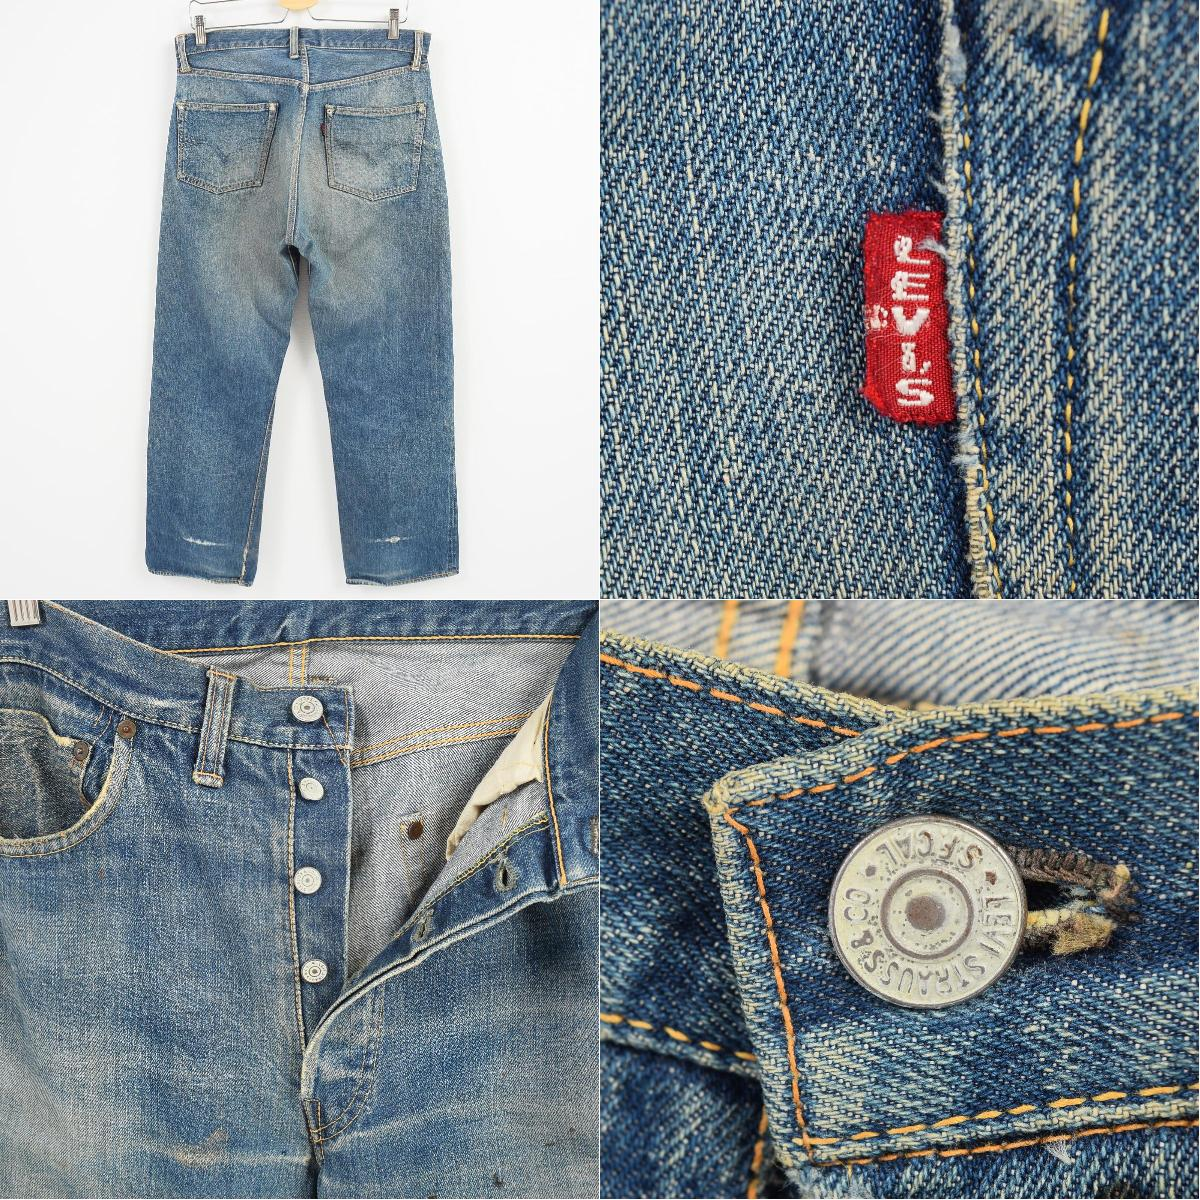 Men w30 vintage /wes8874 in the 50s made in Levis Levi's 501XX jeans straight denim underwear USA